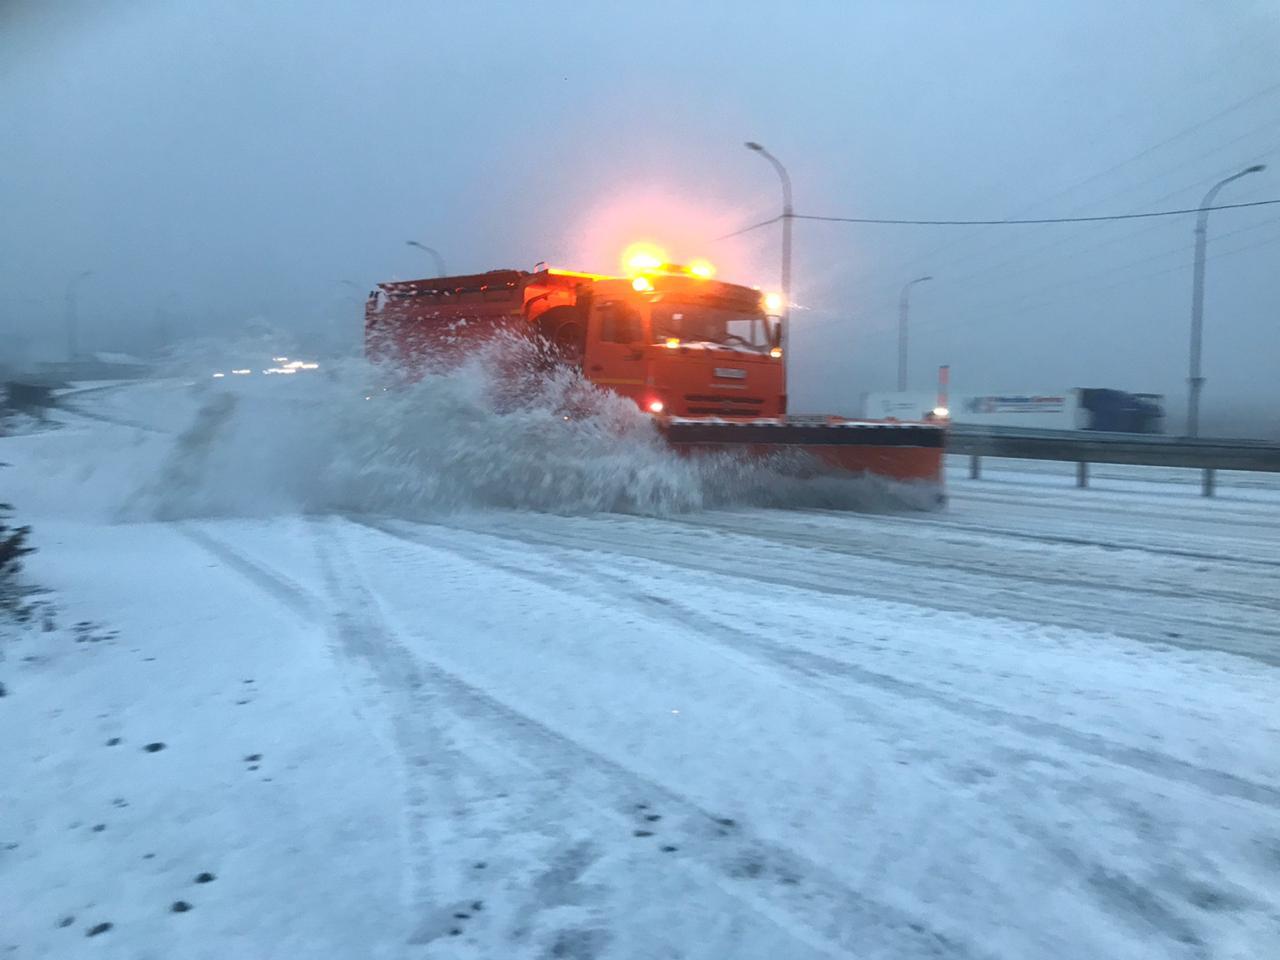 Техника вышла на уборку от снега приморских дорог